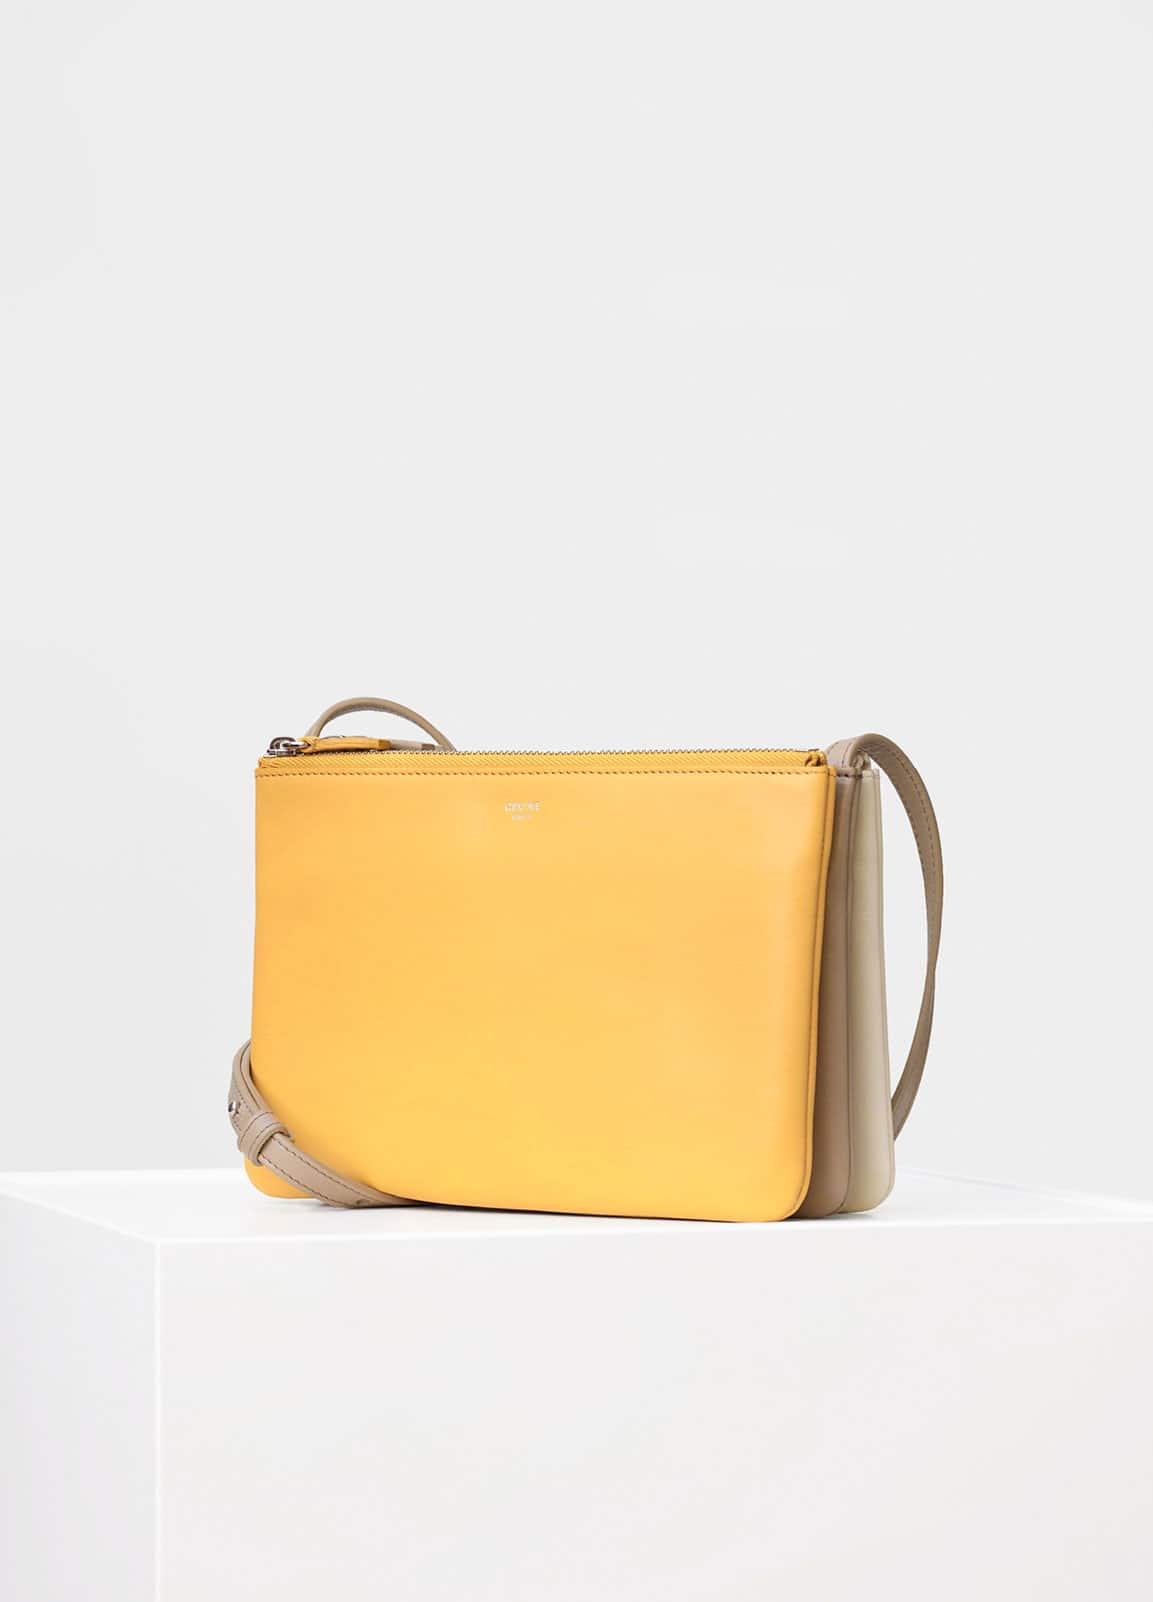 Céline Handbags  The RealReal